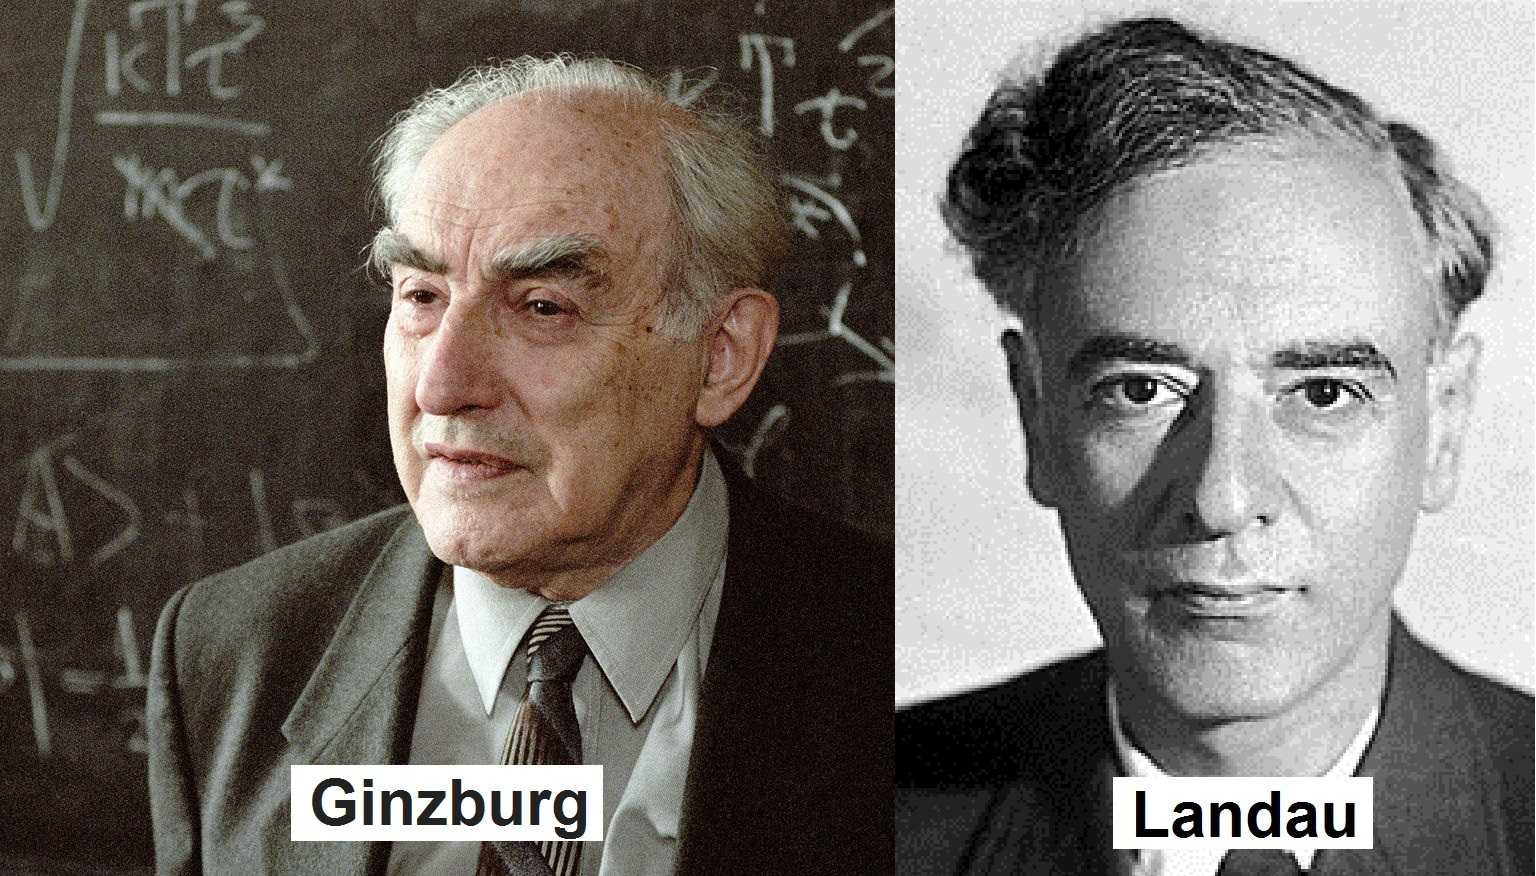 The superconductivity theory of Ginzburg-Landau